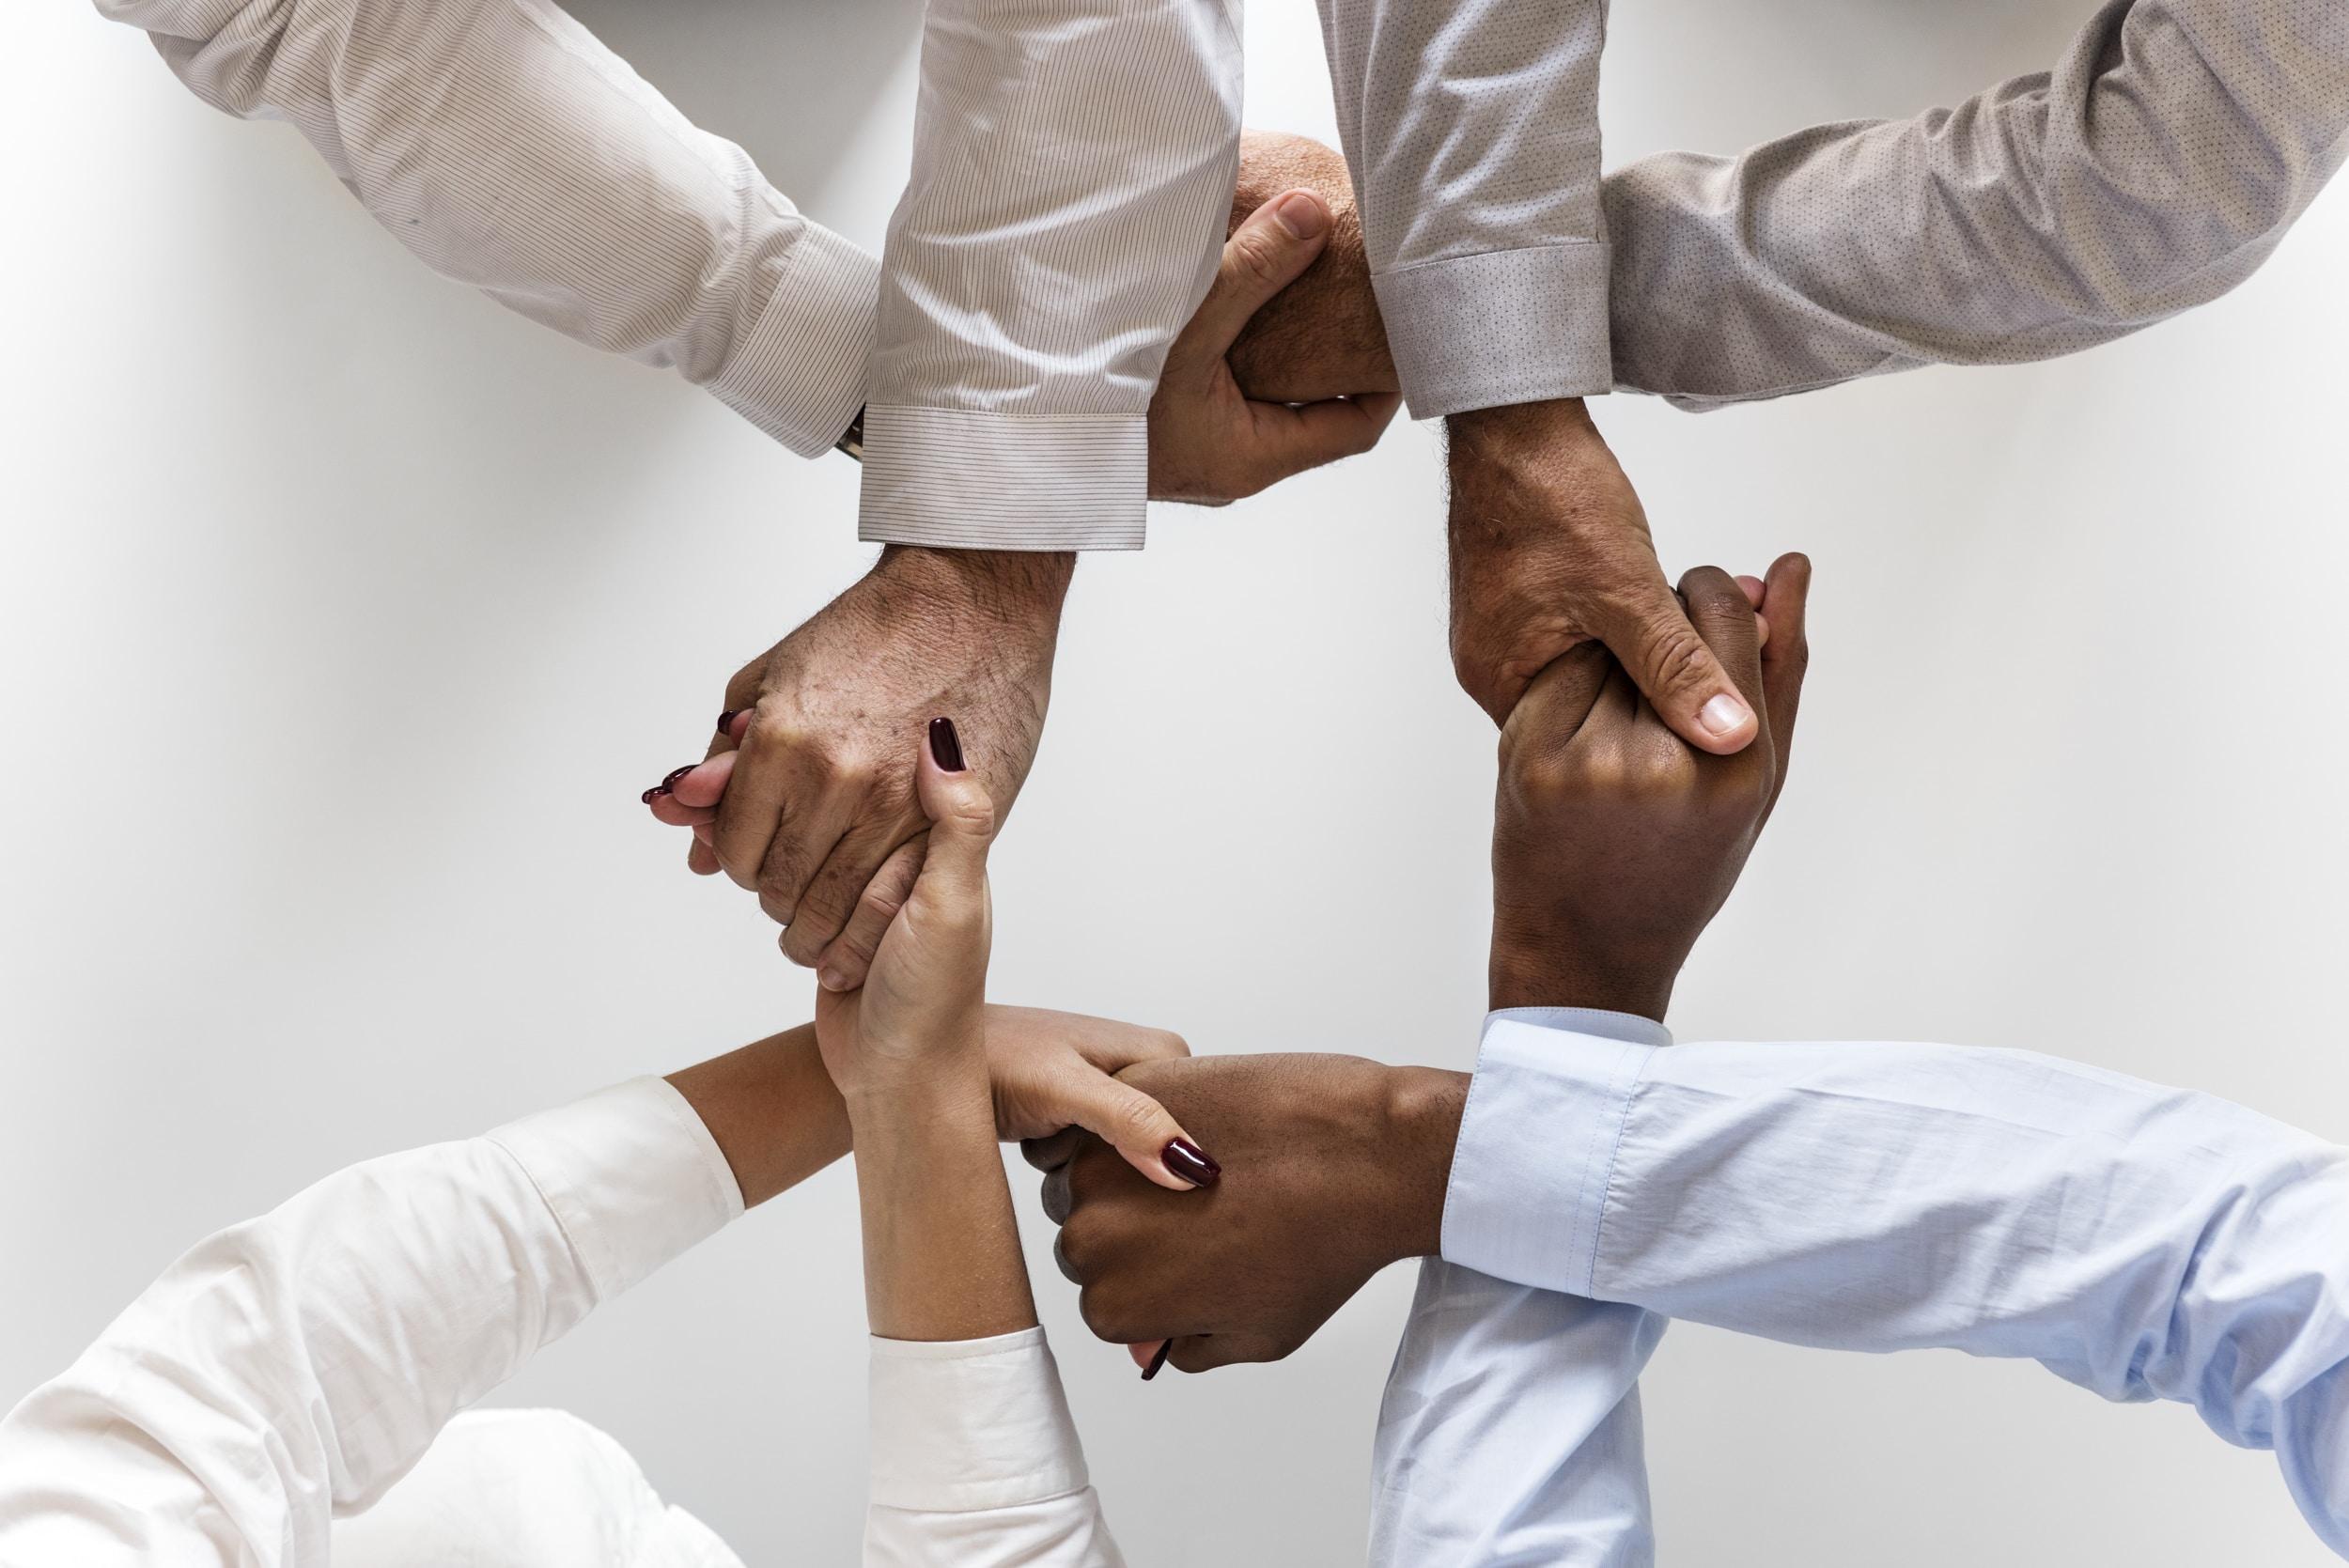 group of people hand gesture